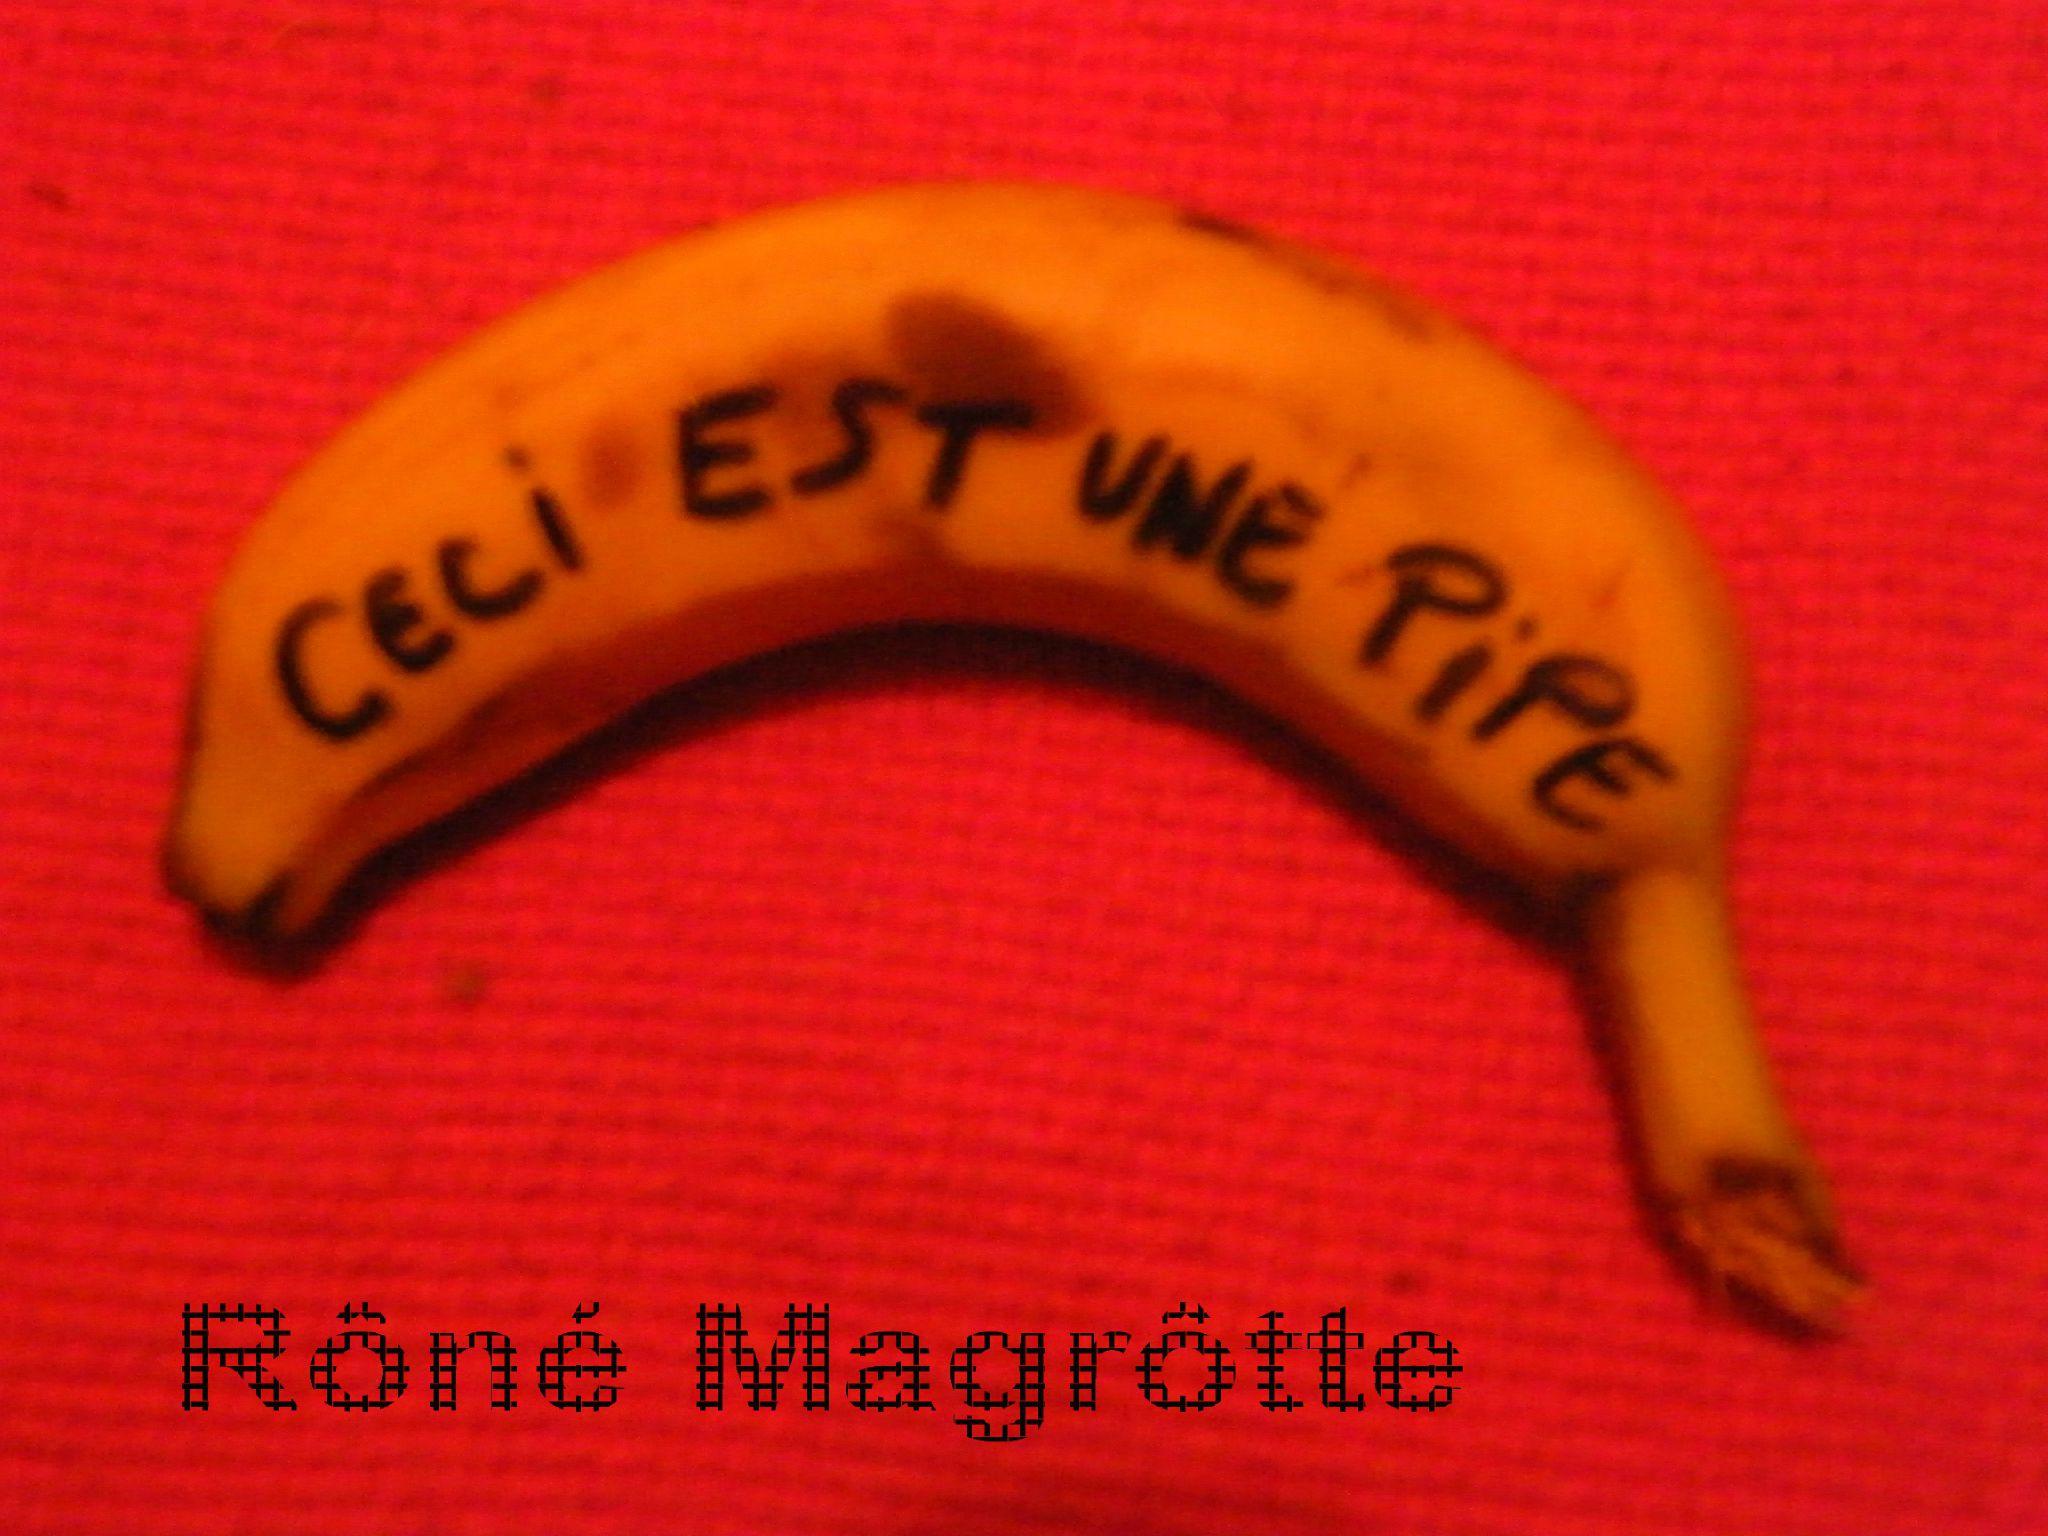 Rôné Magrôtte